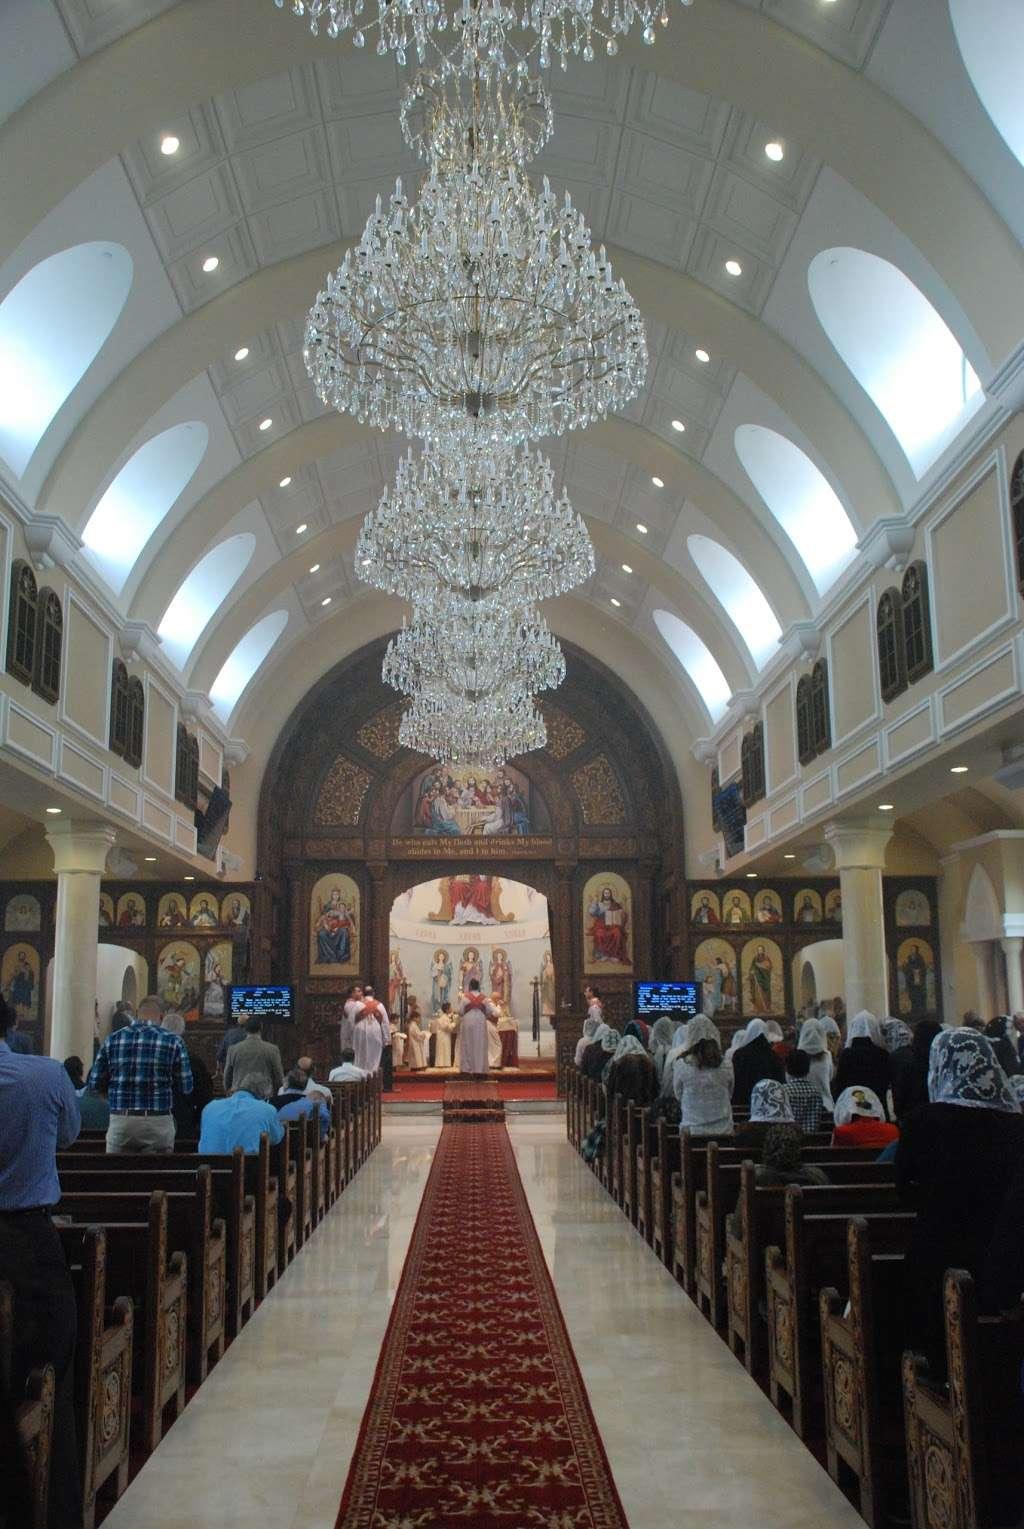 St Mary Coptic Orthodox Church - church  | Photo 5 of 10 | Address: 15450 Lyons Rd, Delray Beach, FL 33484, USA | Phone: (561) 870-5004